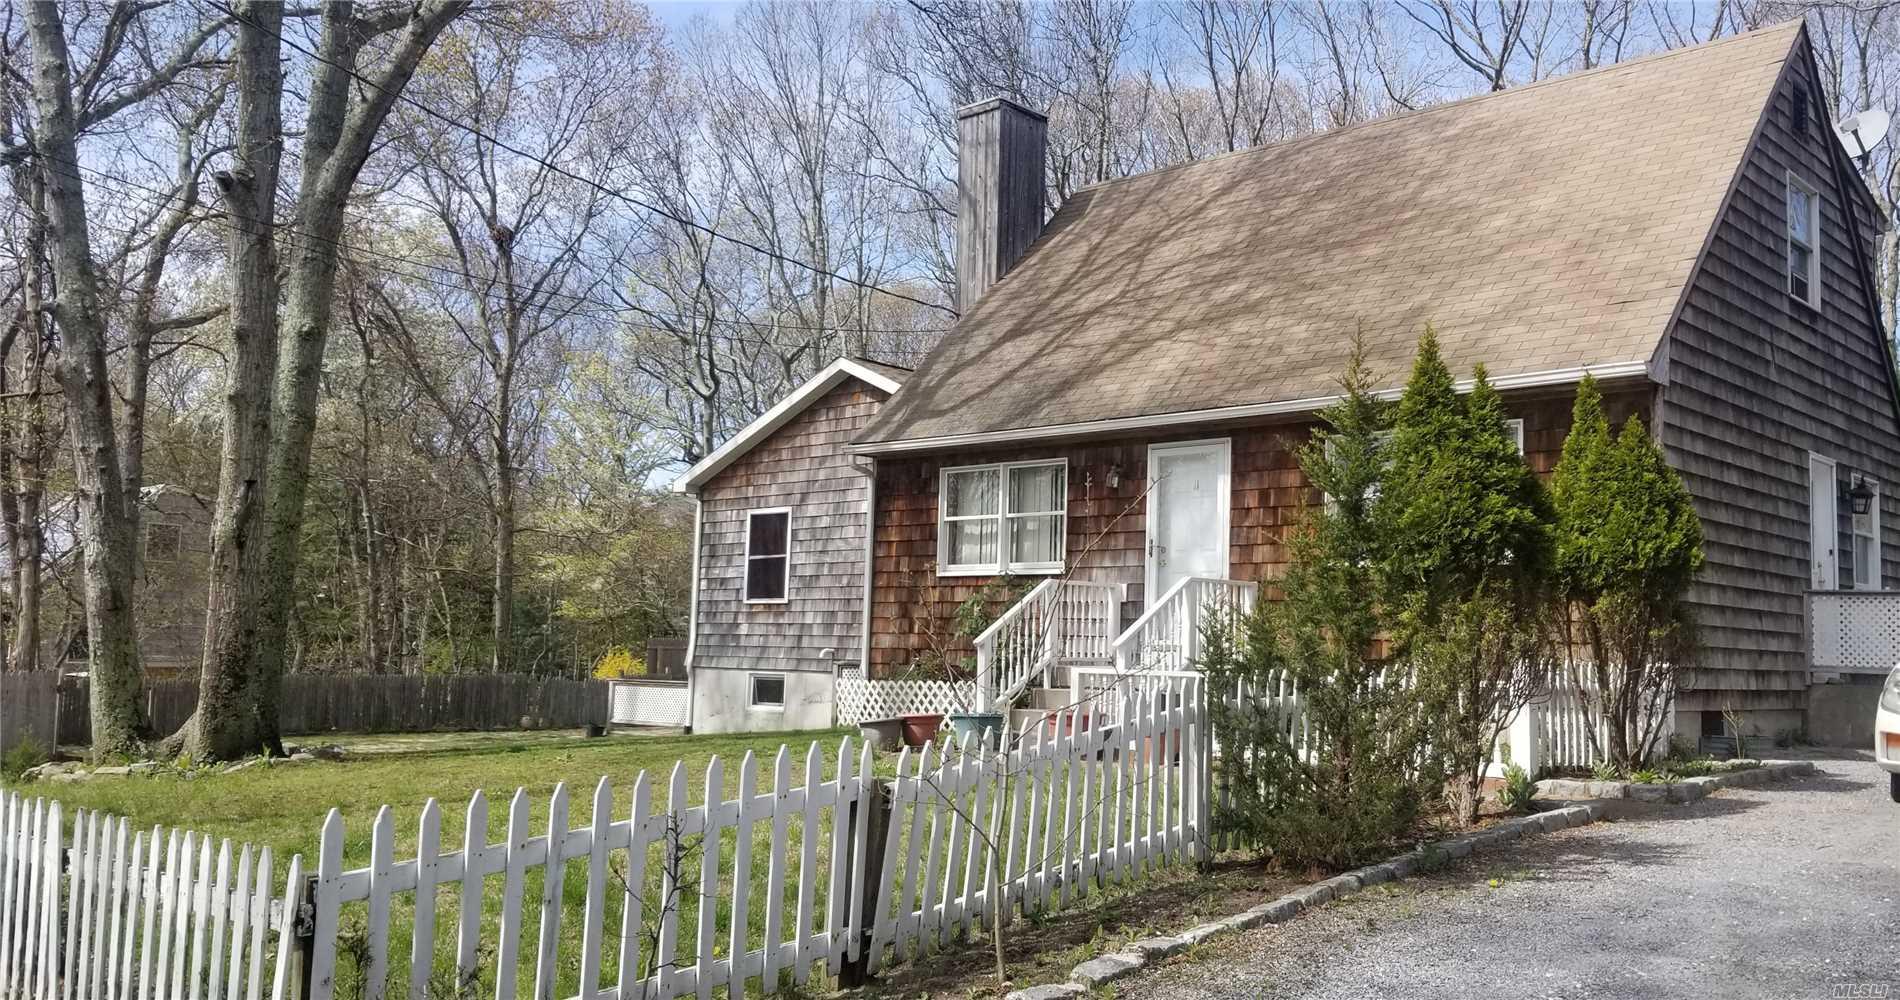 11 Gardiners Ln - East Hampton, New York